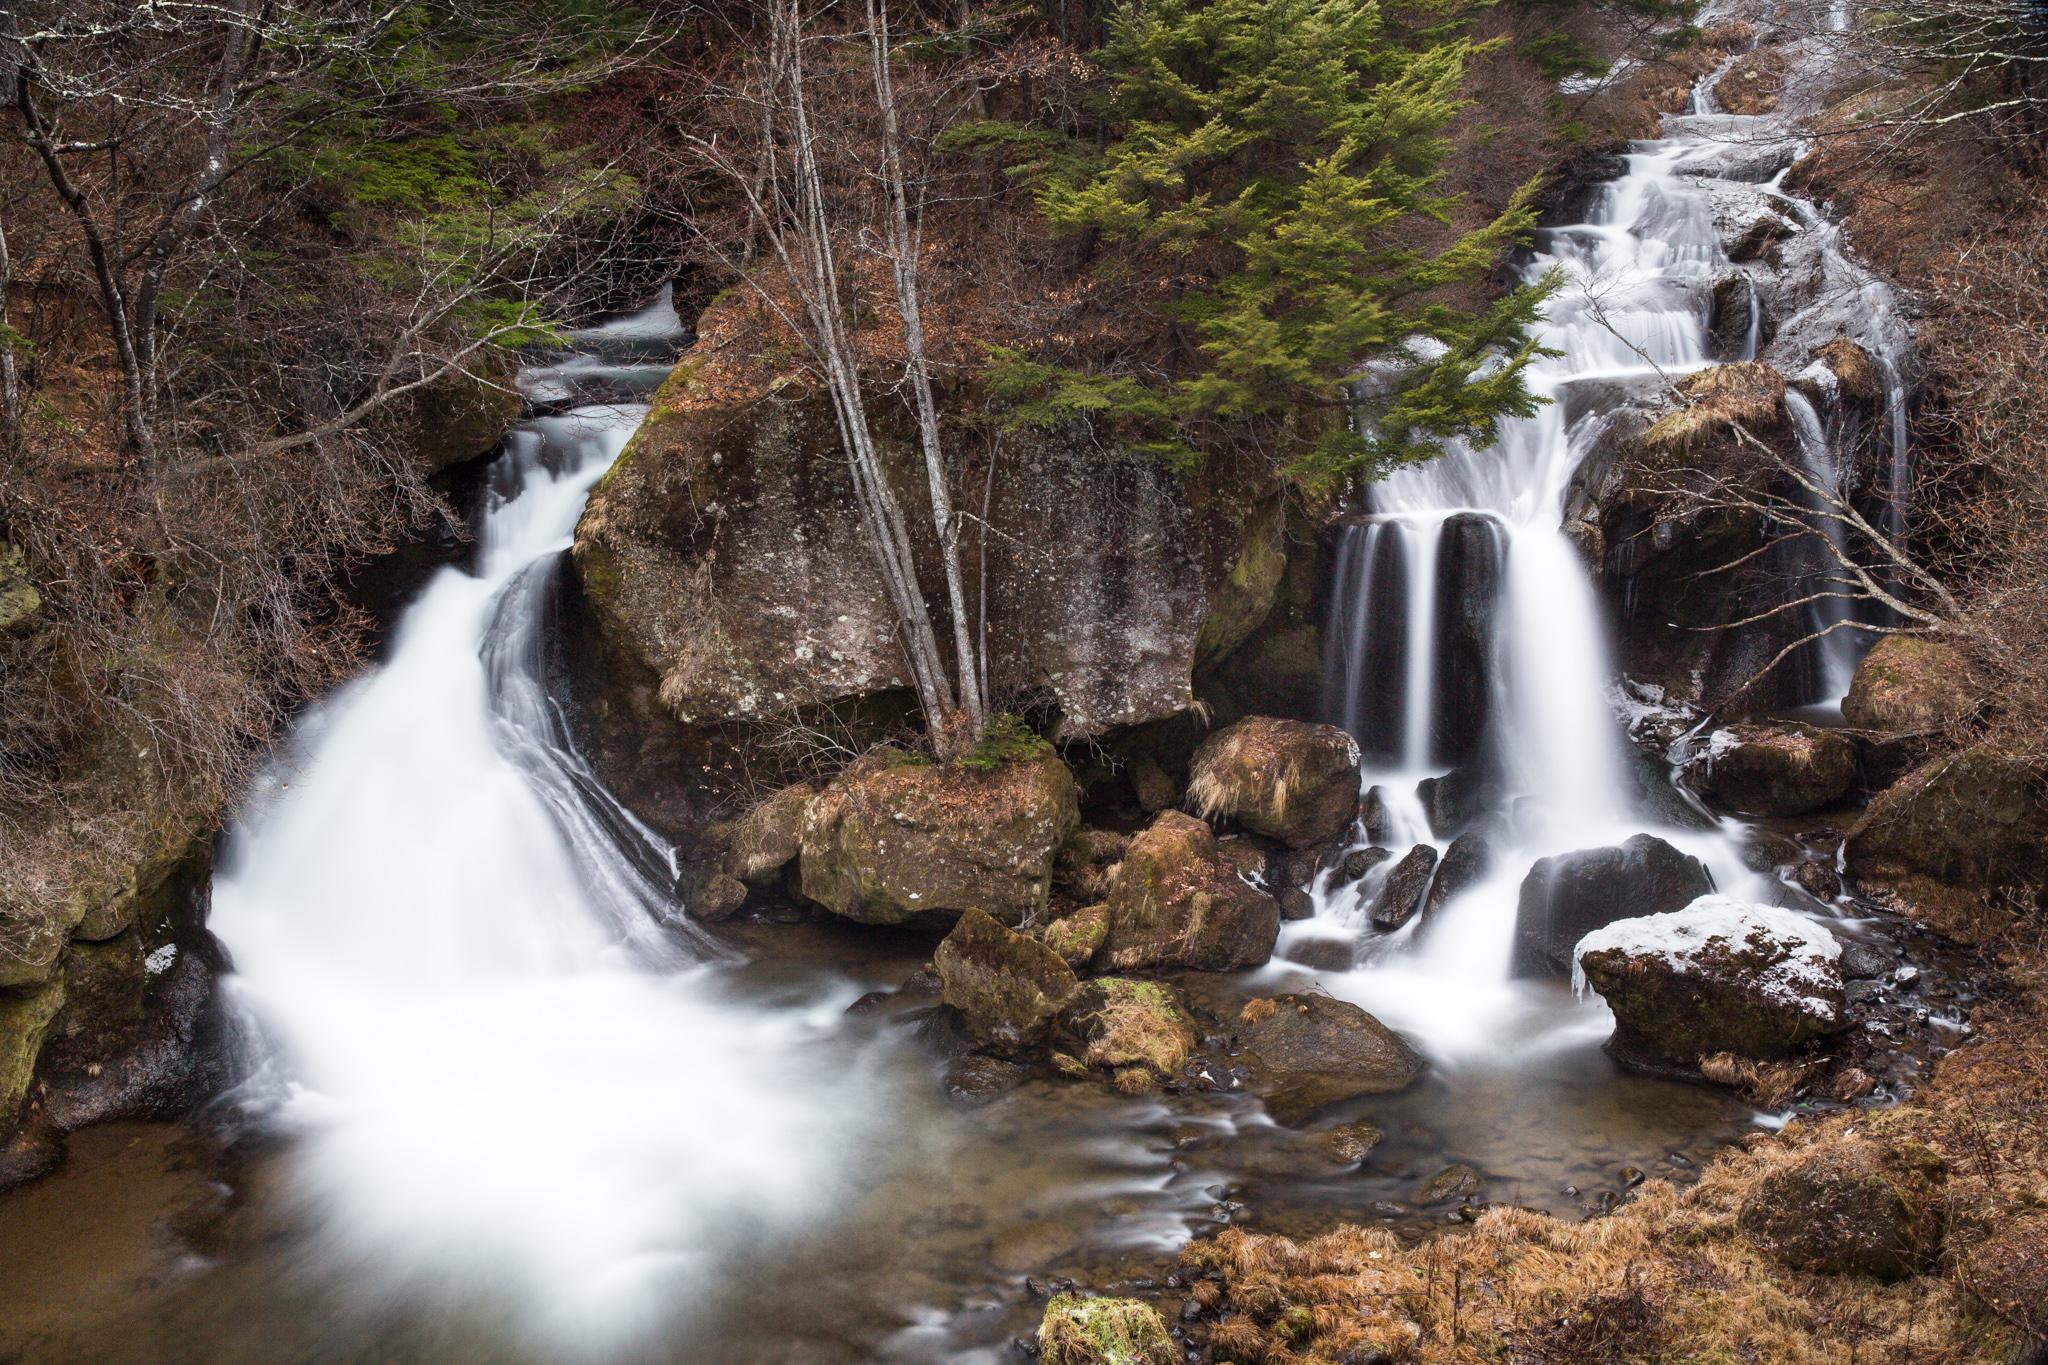 6648-japan-nature-waterfall.jpg